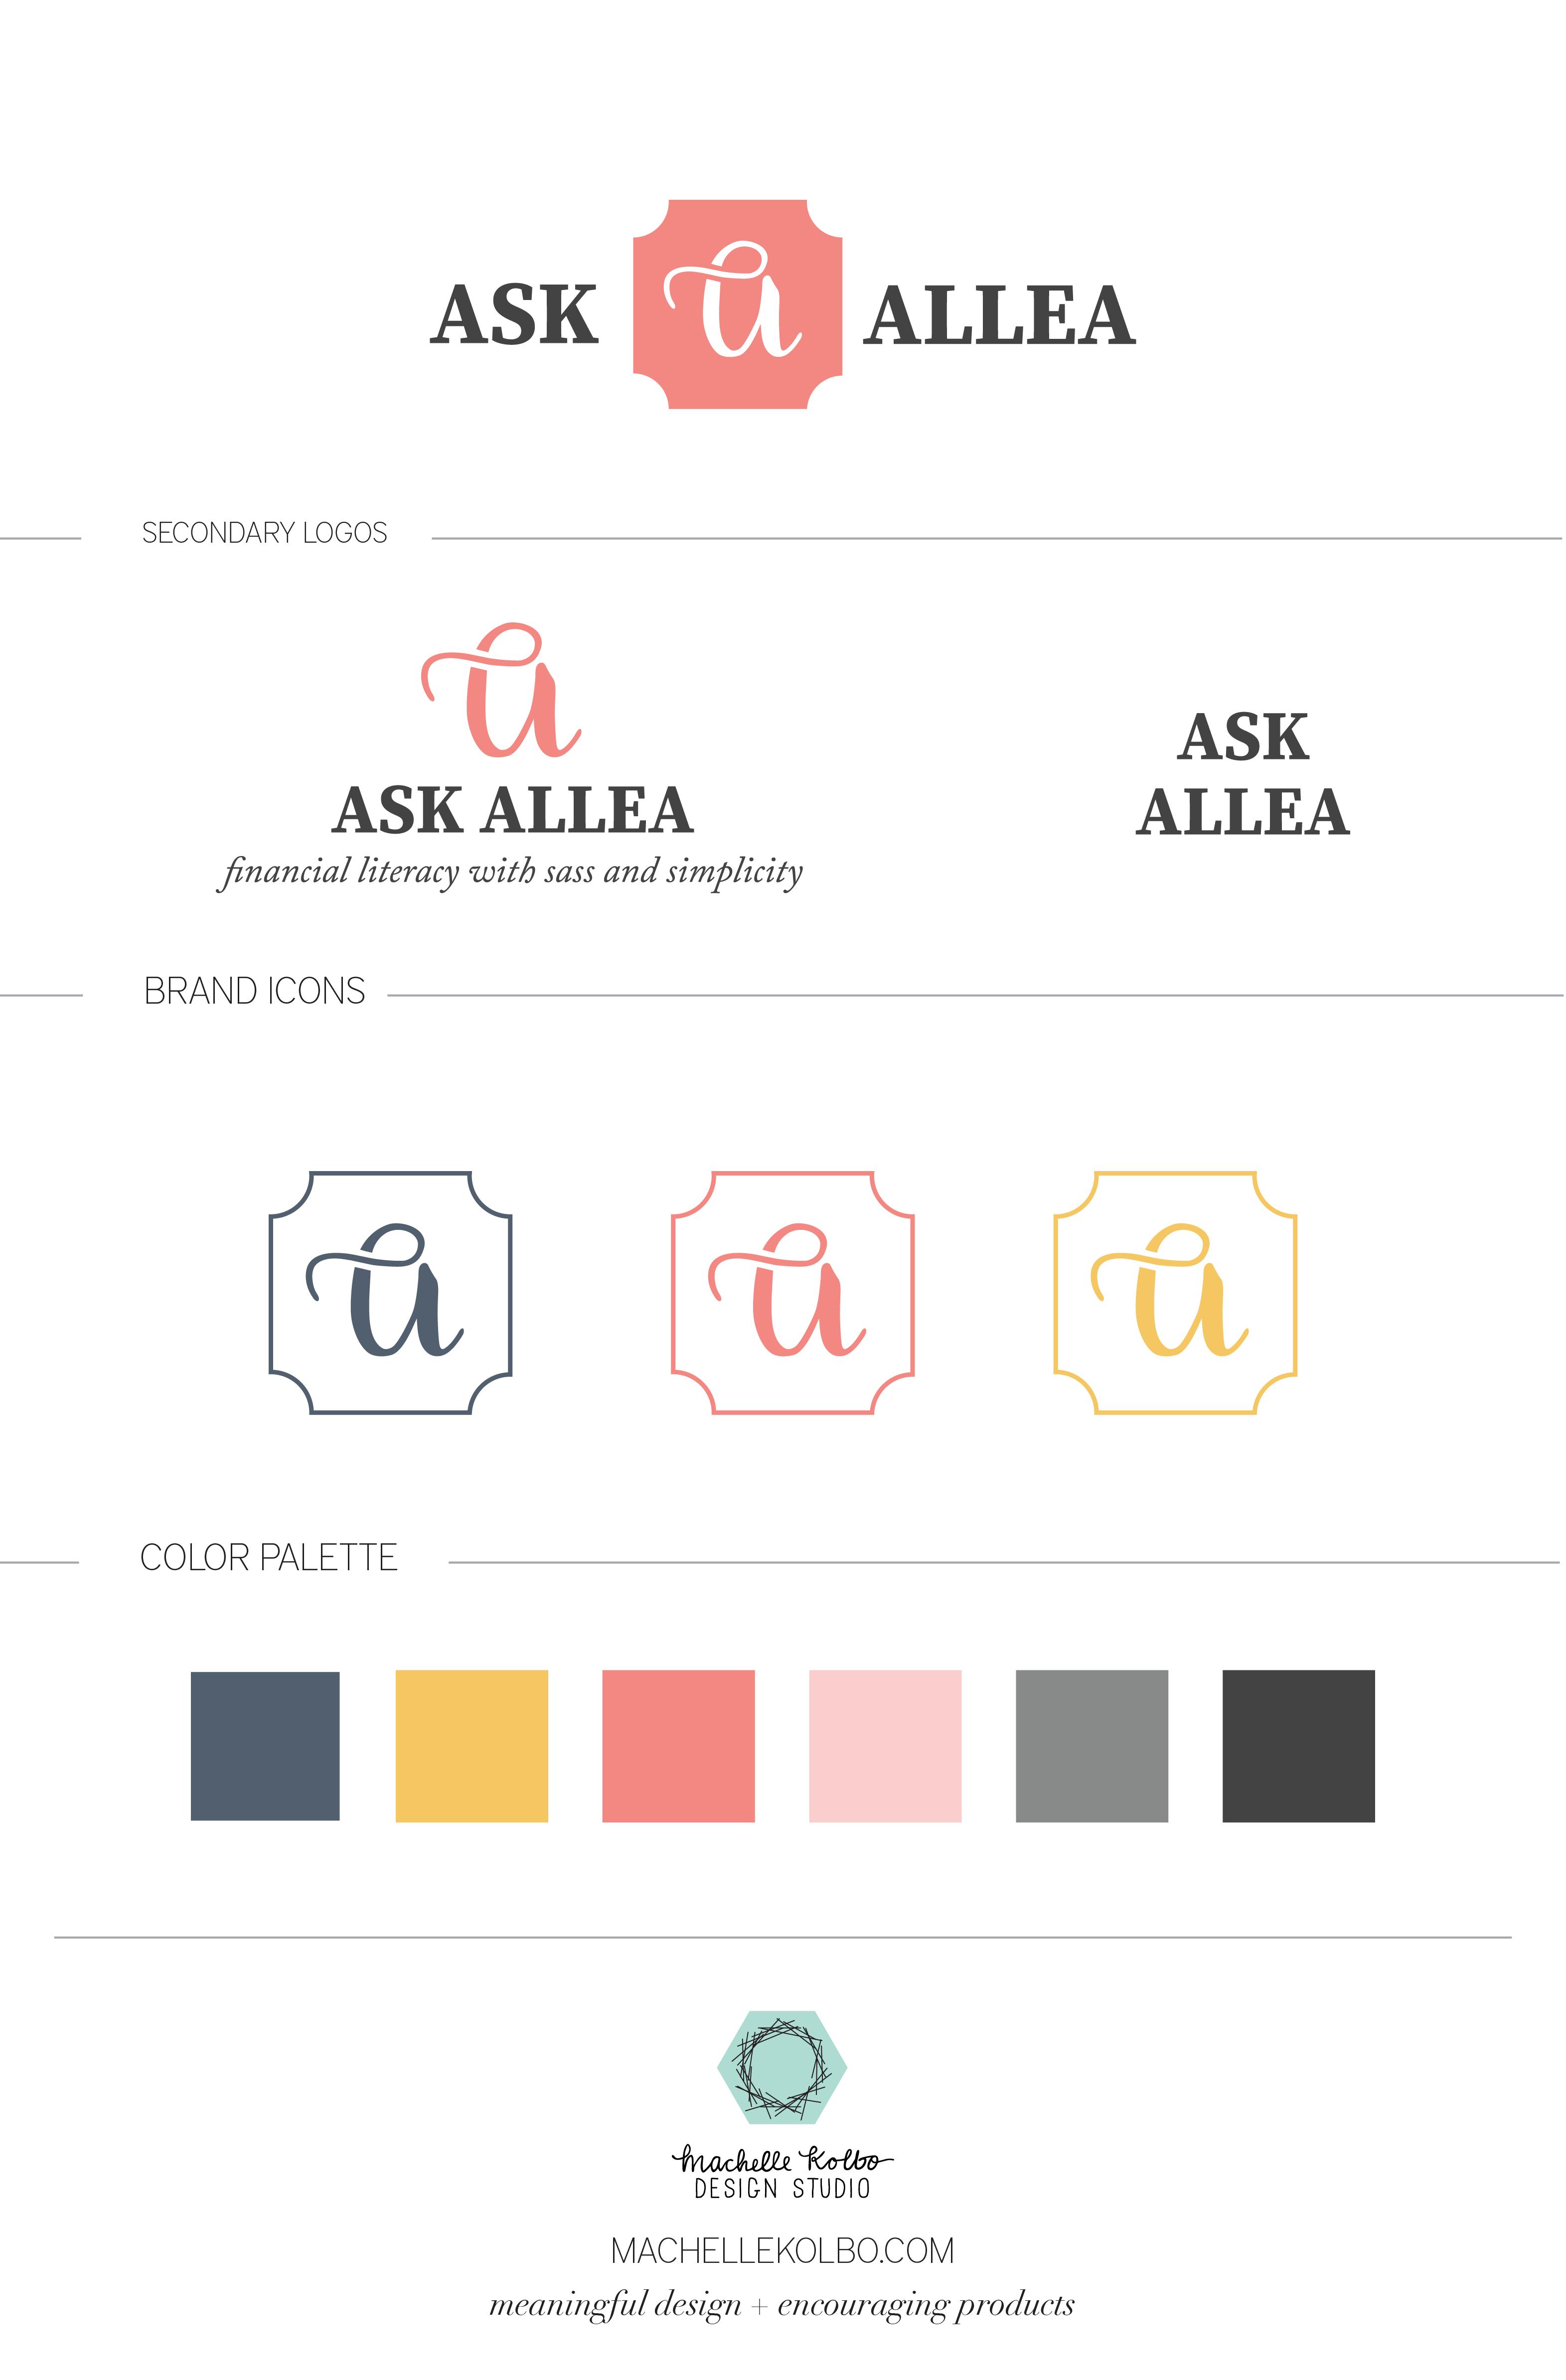 Ask Allea Brand Identity Style Guide | Machelle Kolbo Design Studio